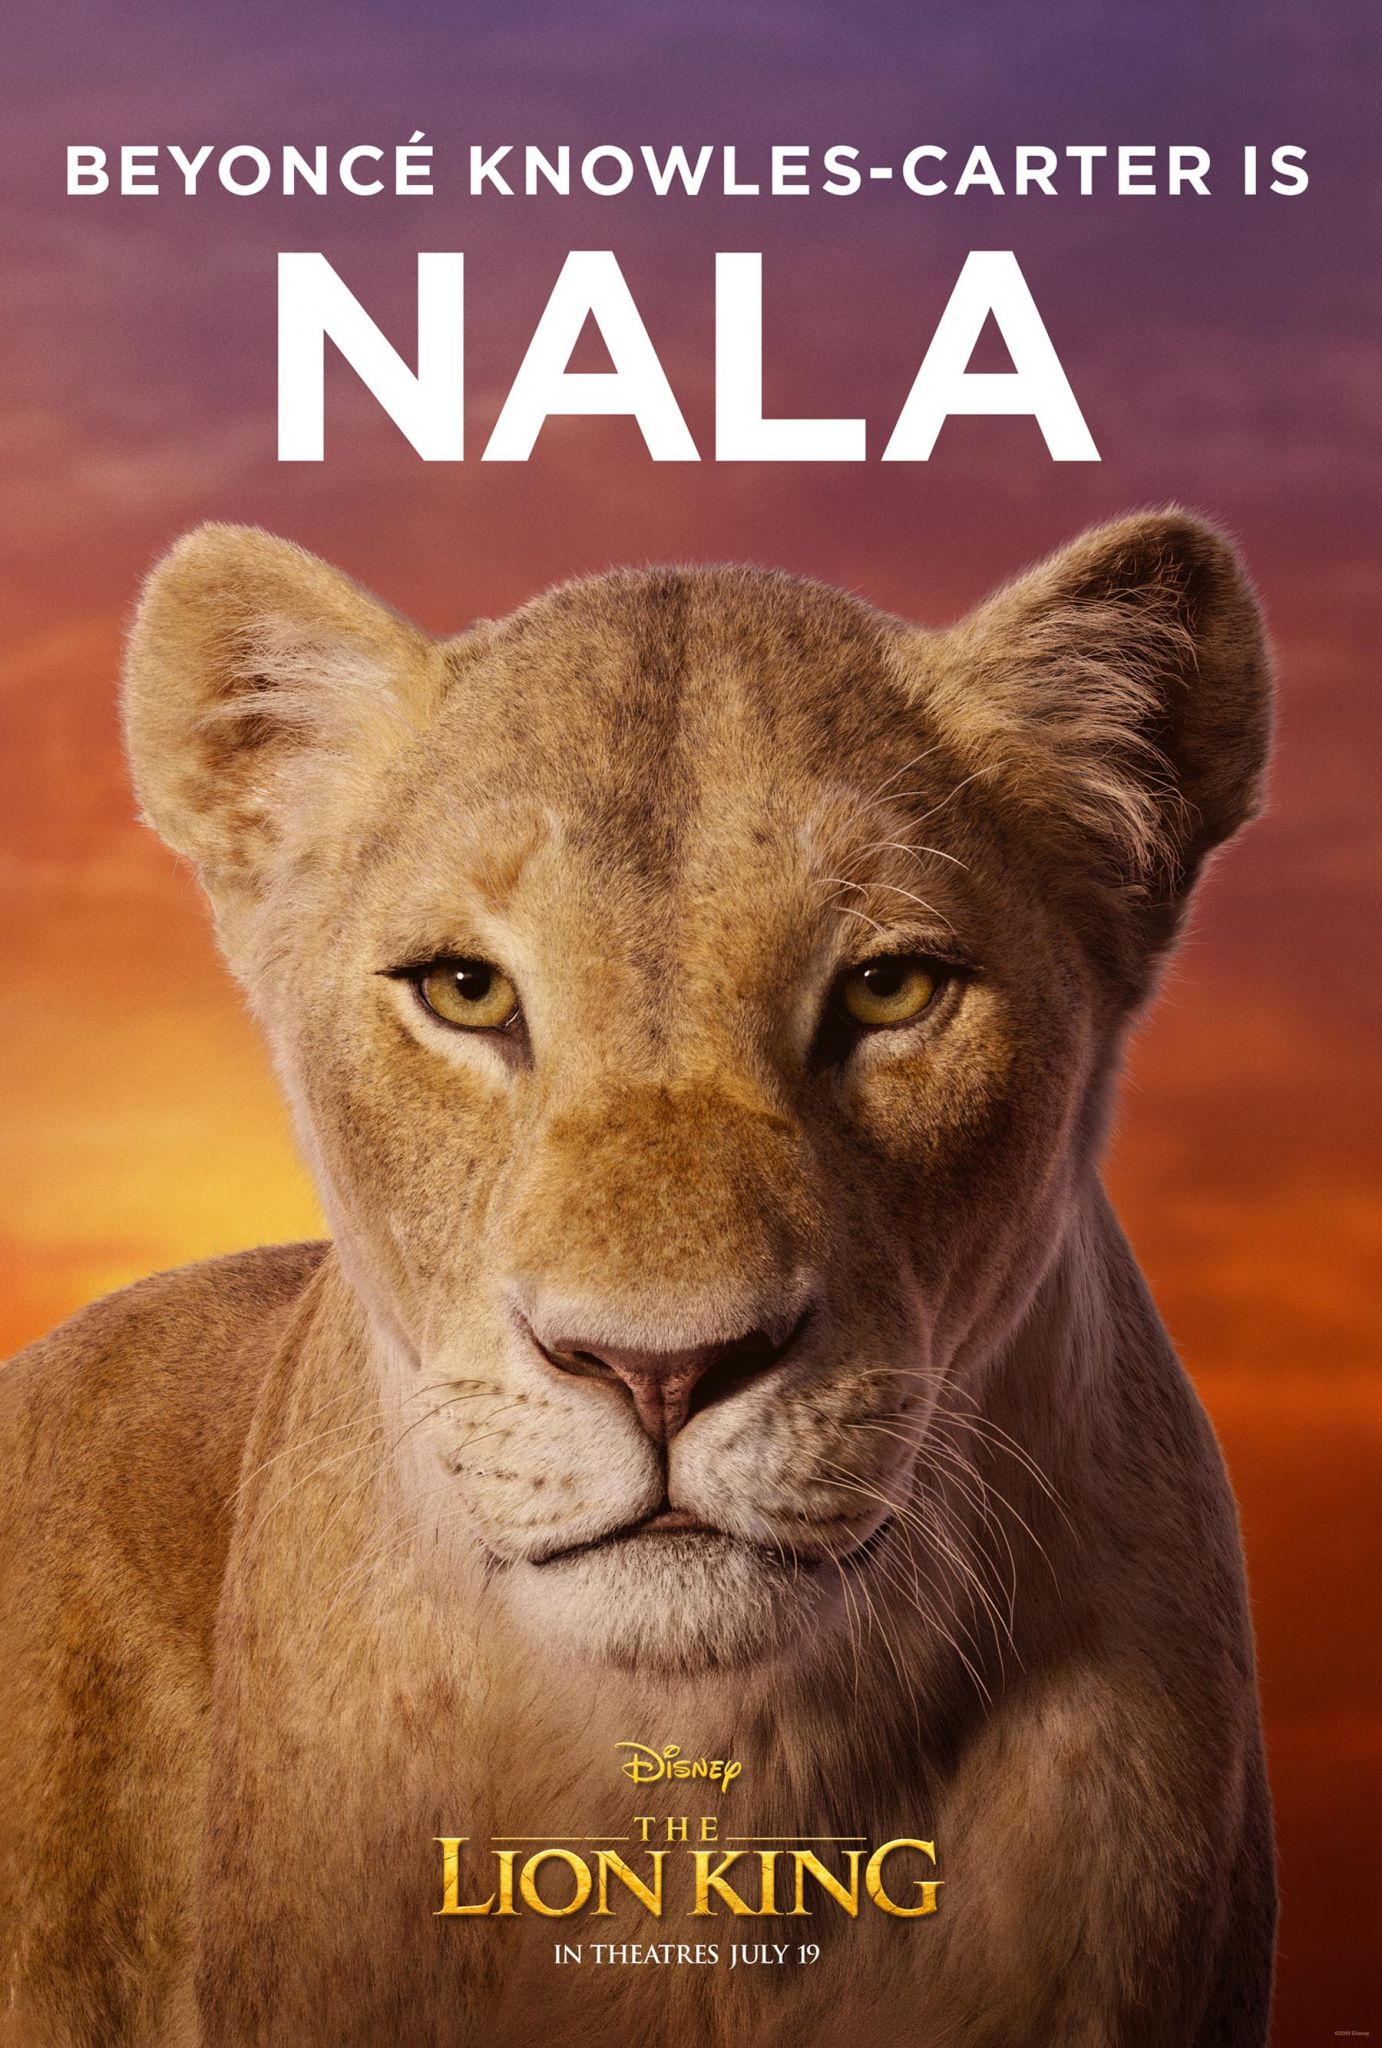 New Lion King Movie Posters Shows Beyonce S Role As Nala Alton Telegraph